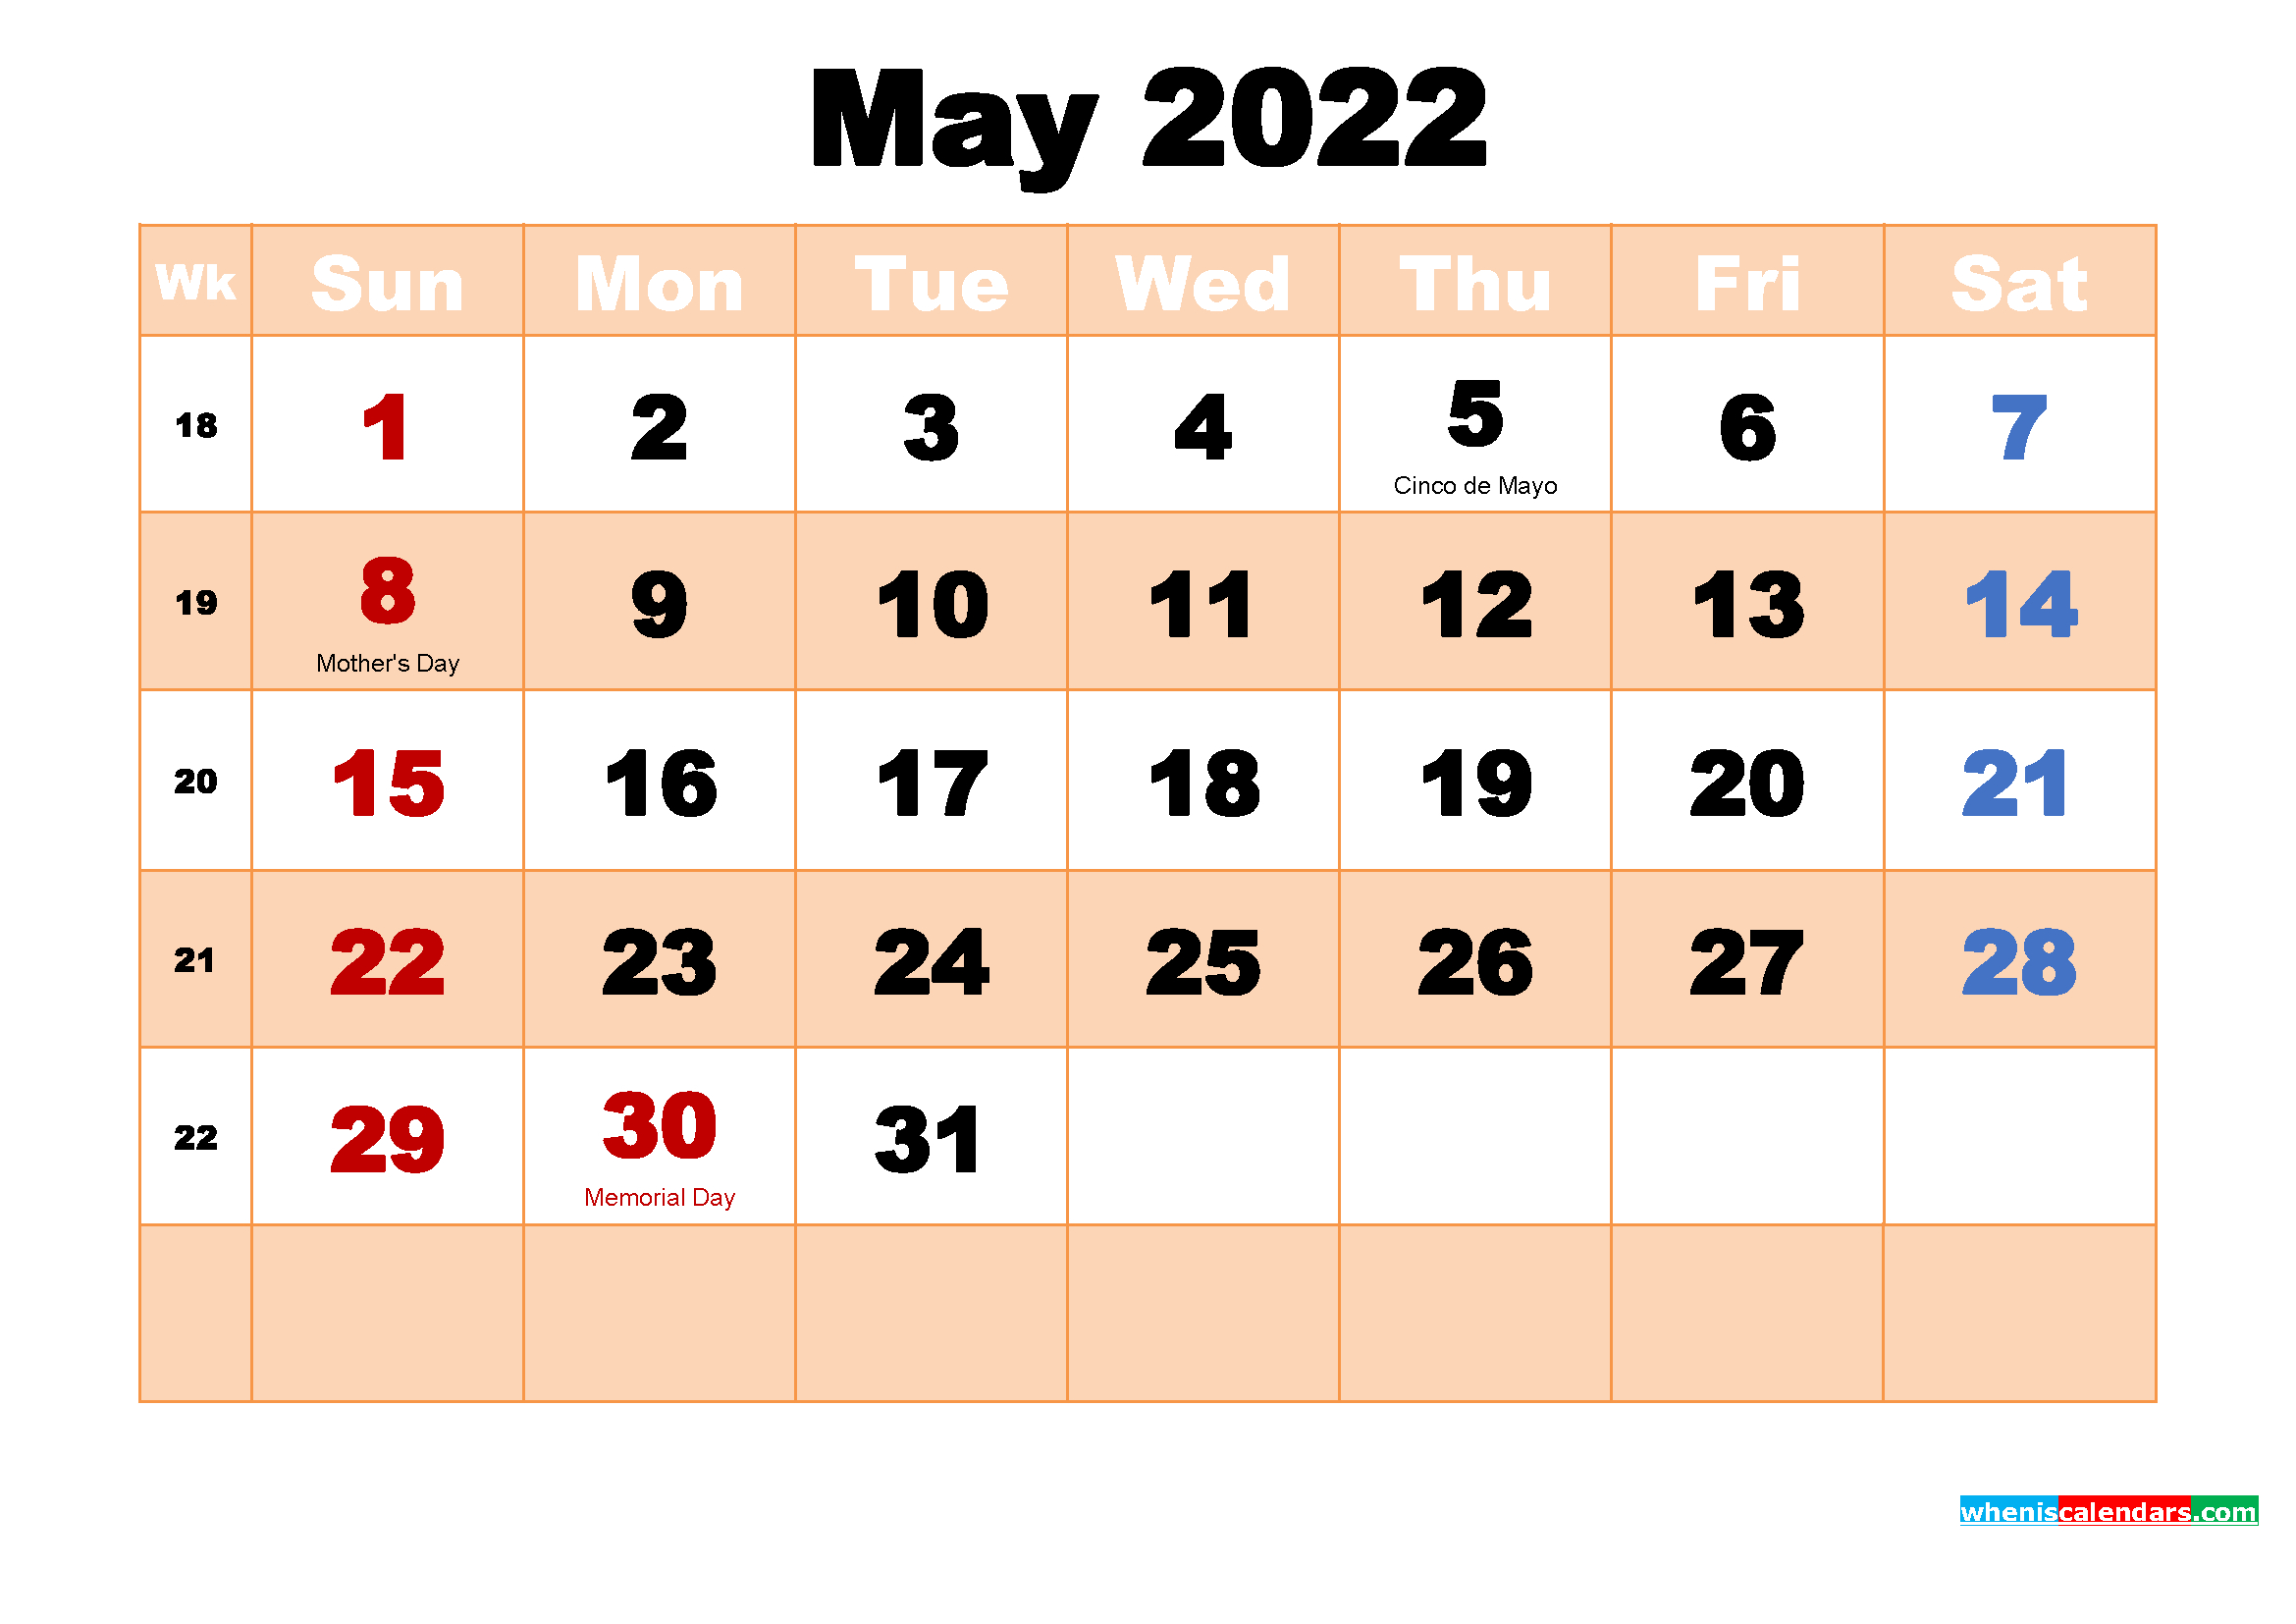 Free Printable May 2022 Calendar With Holidays inside May 2022 Calendar Printable